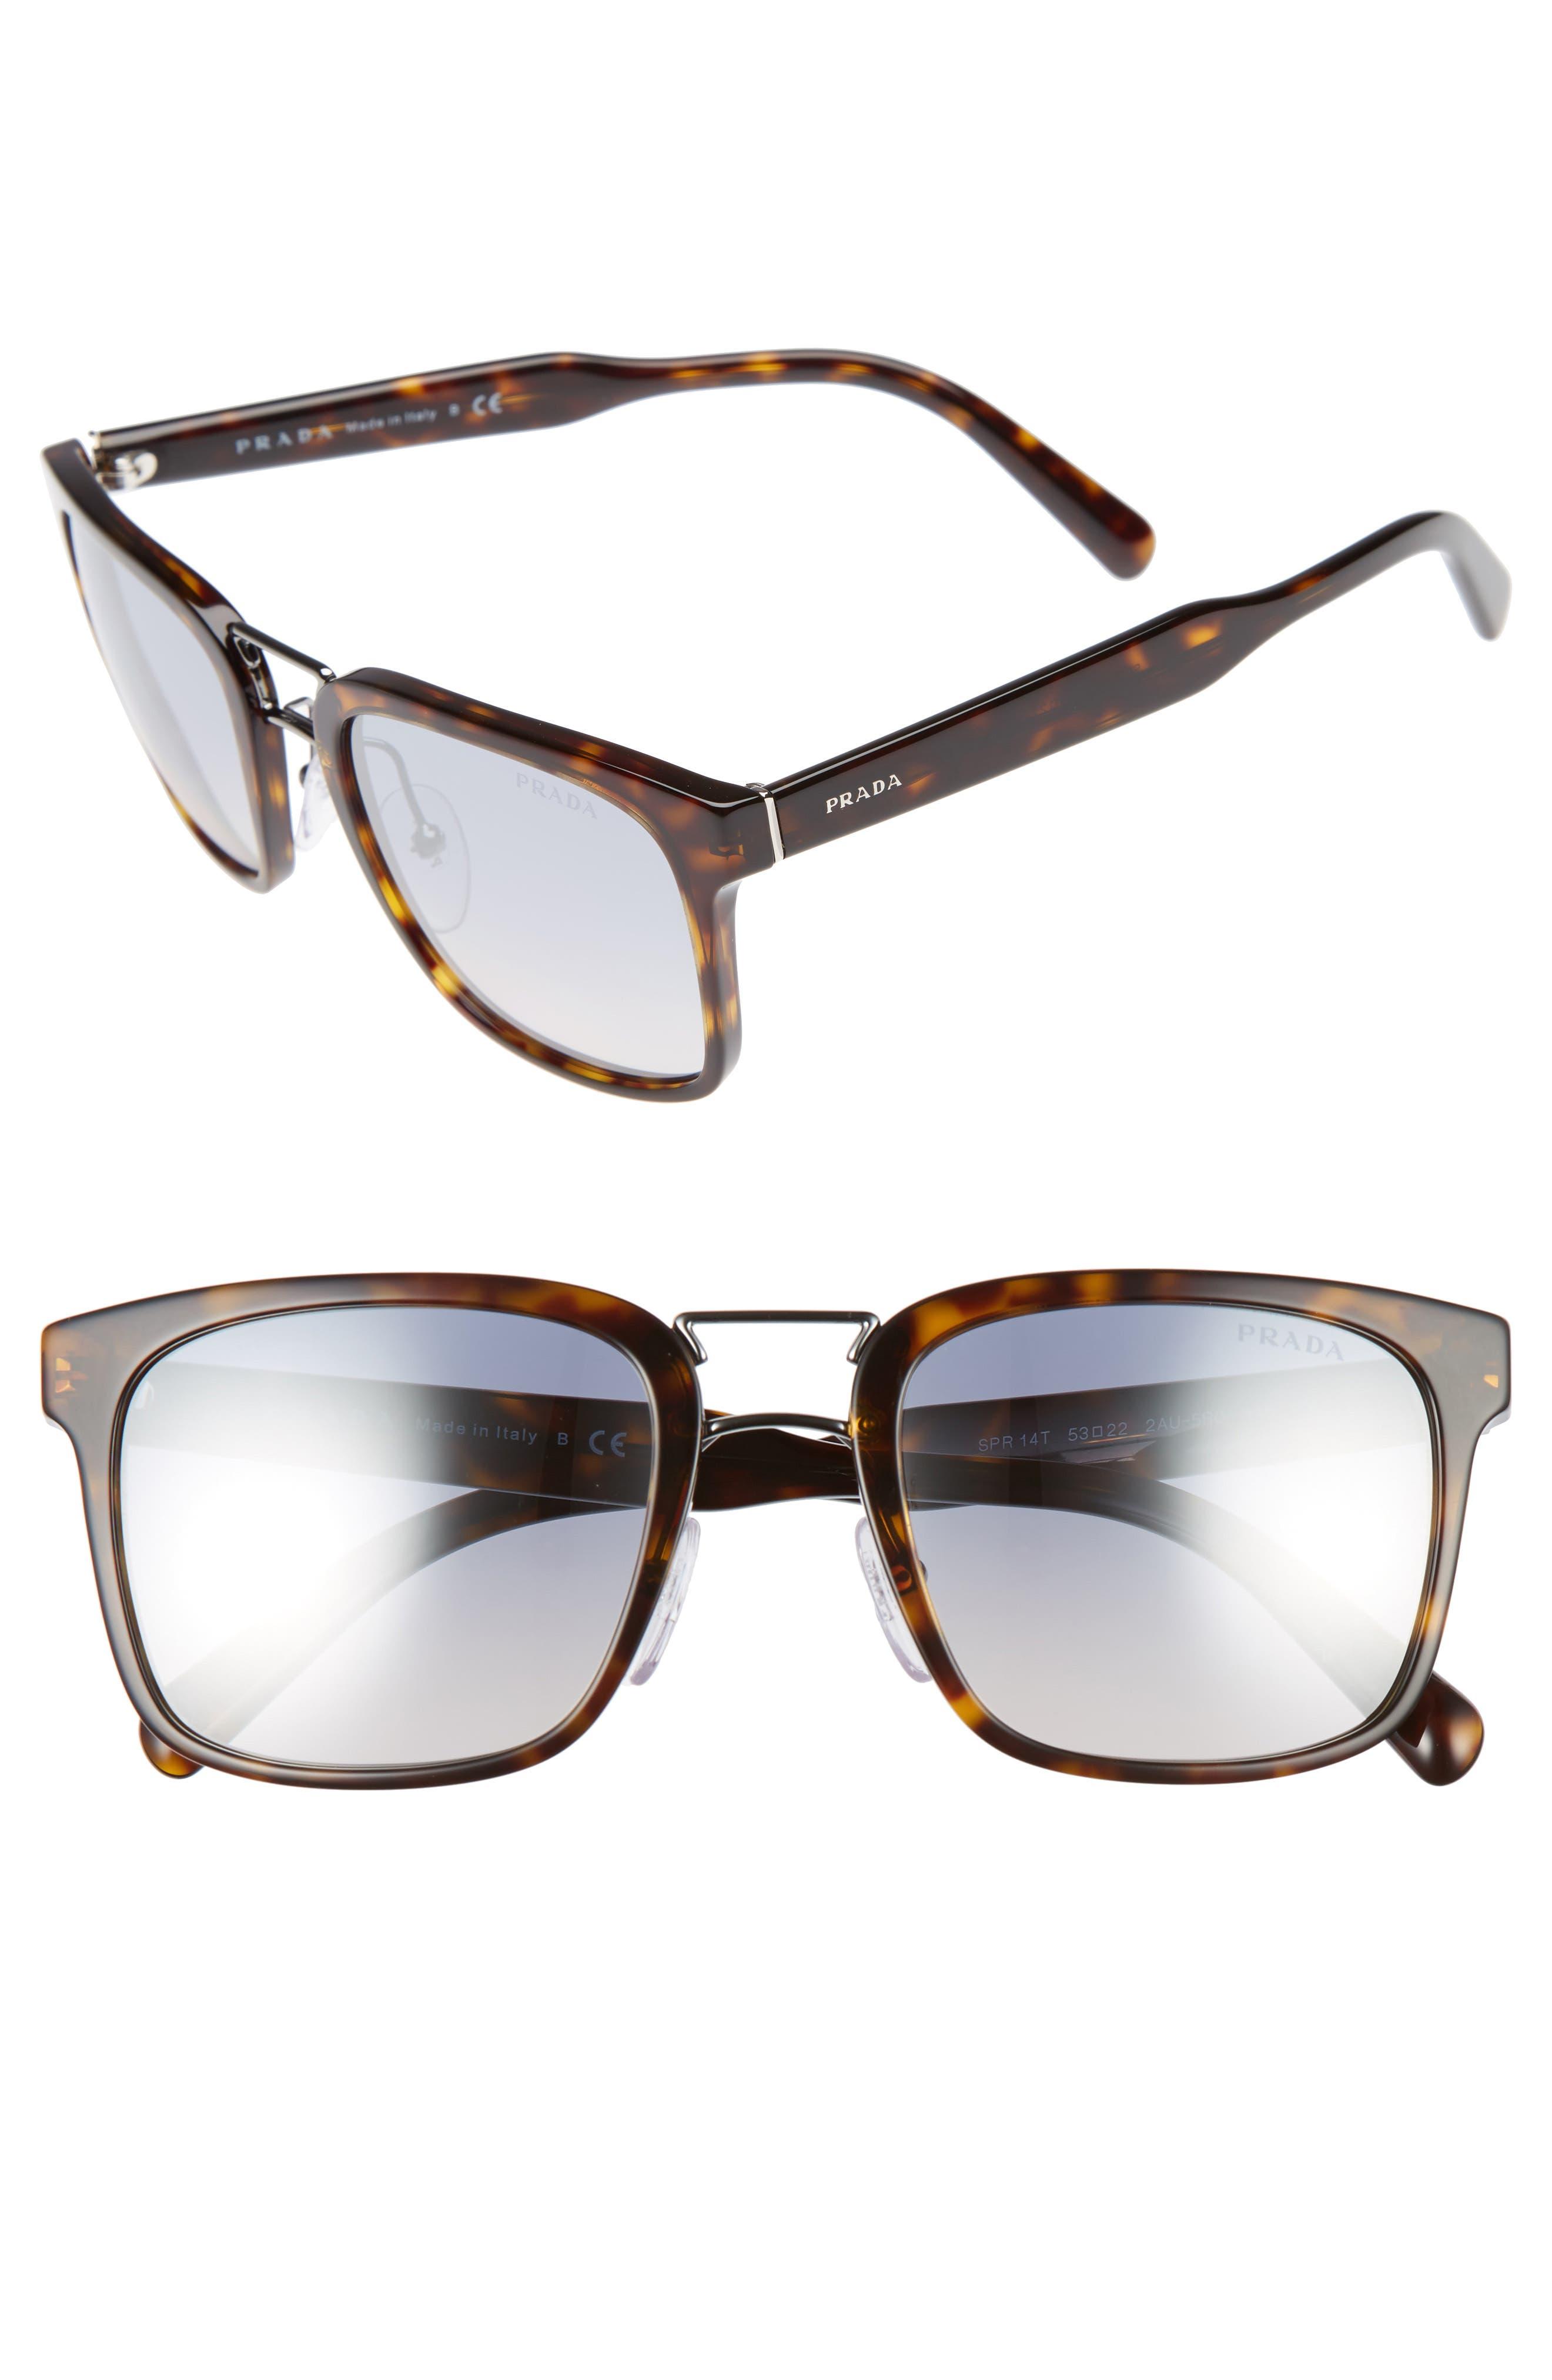 Prada 53mm Sunglasses